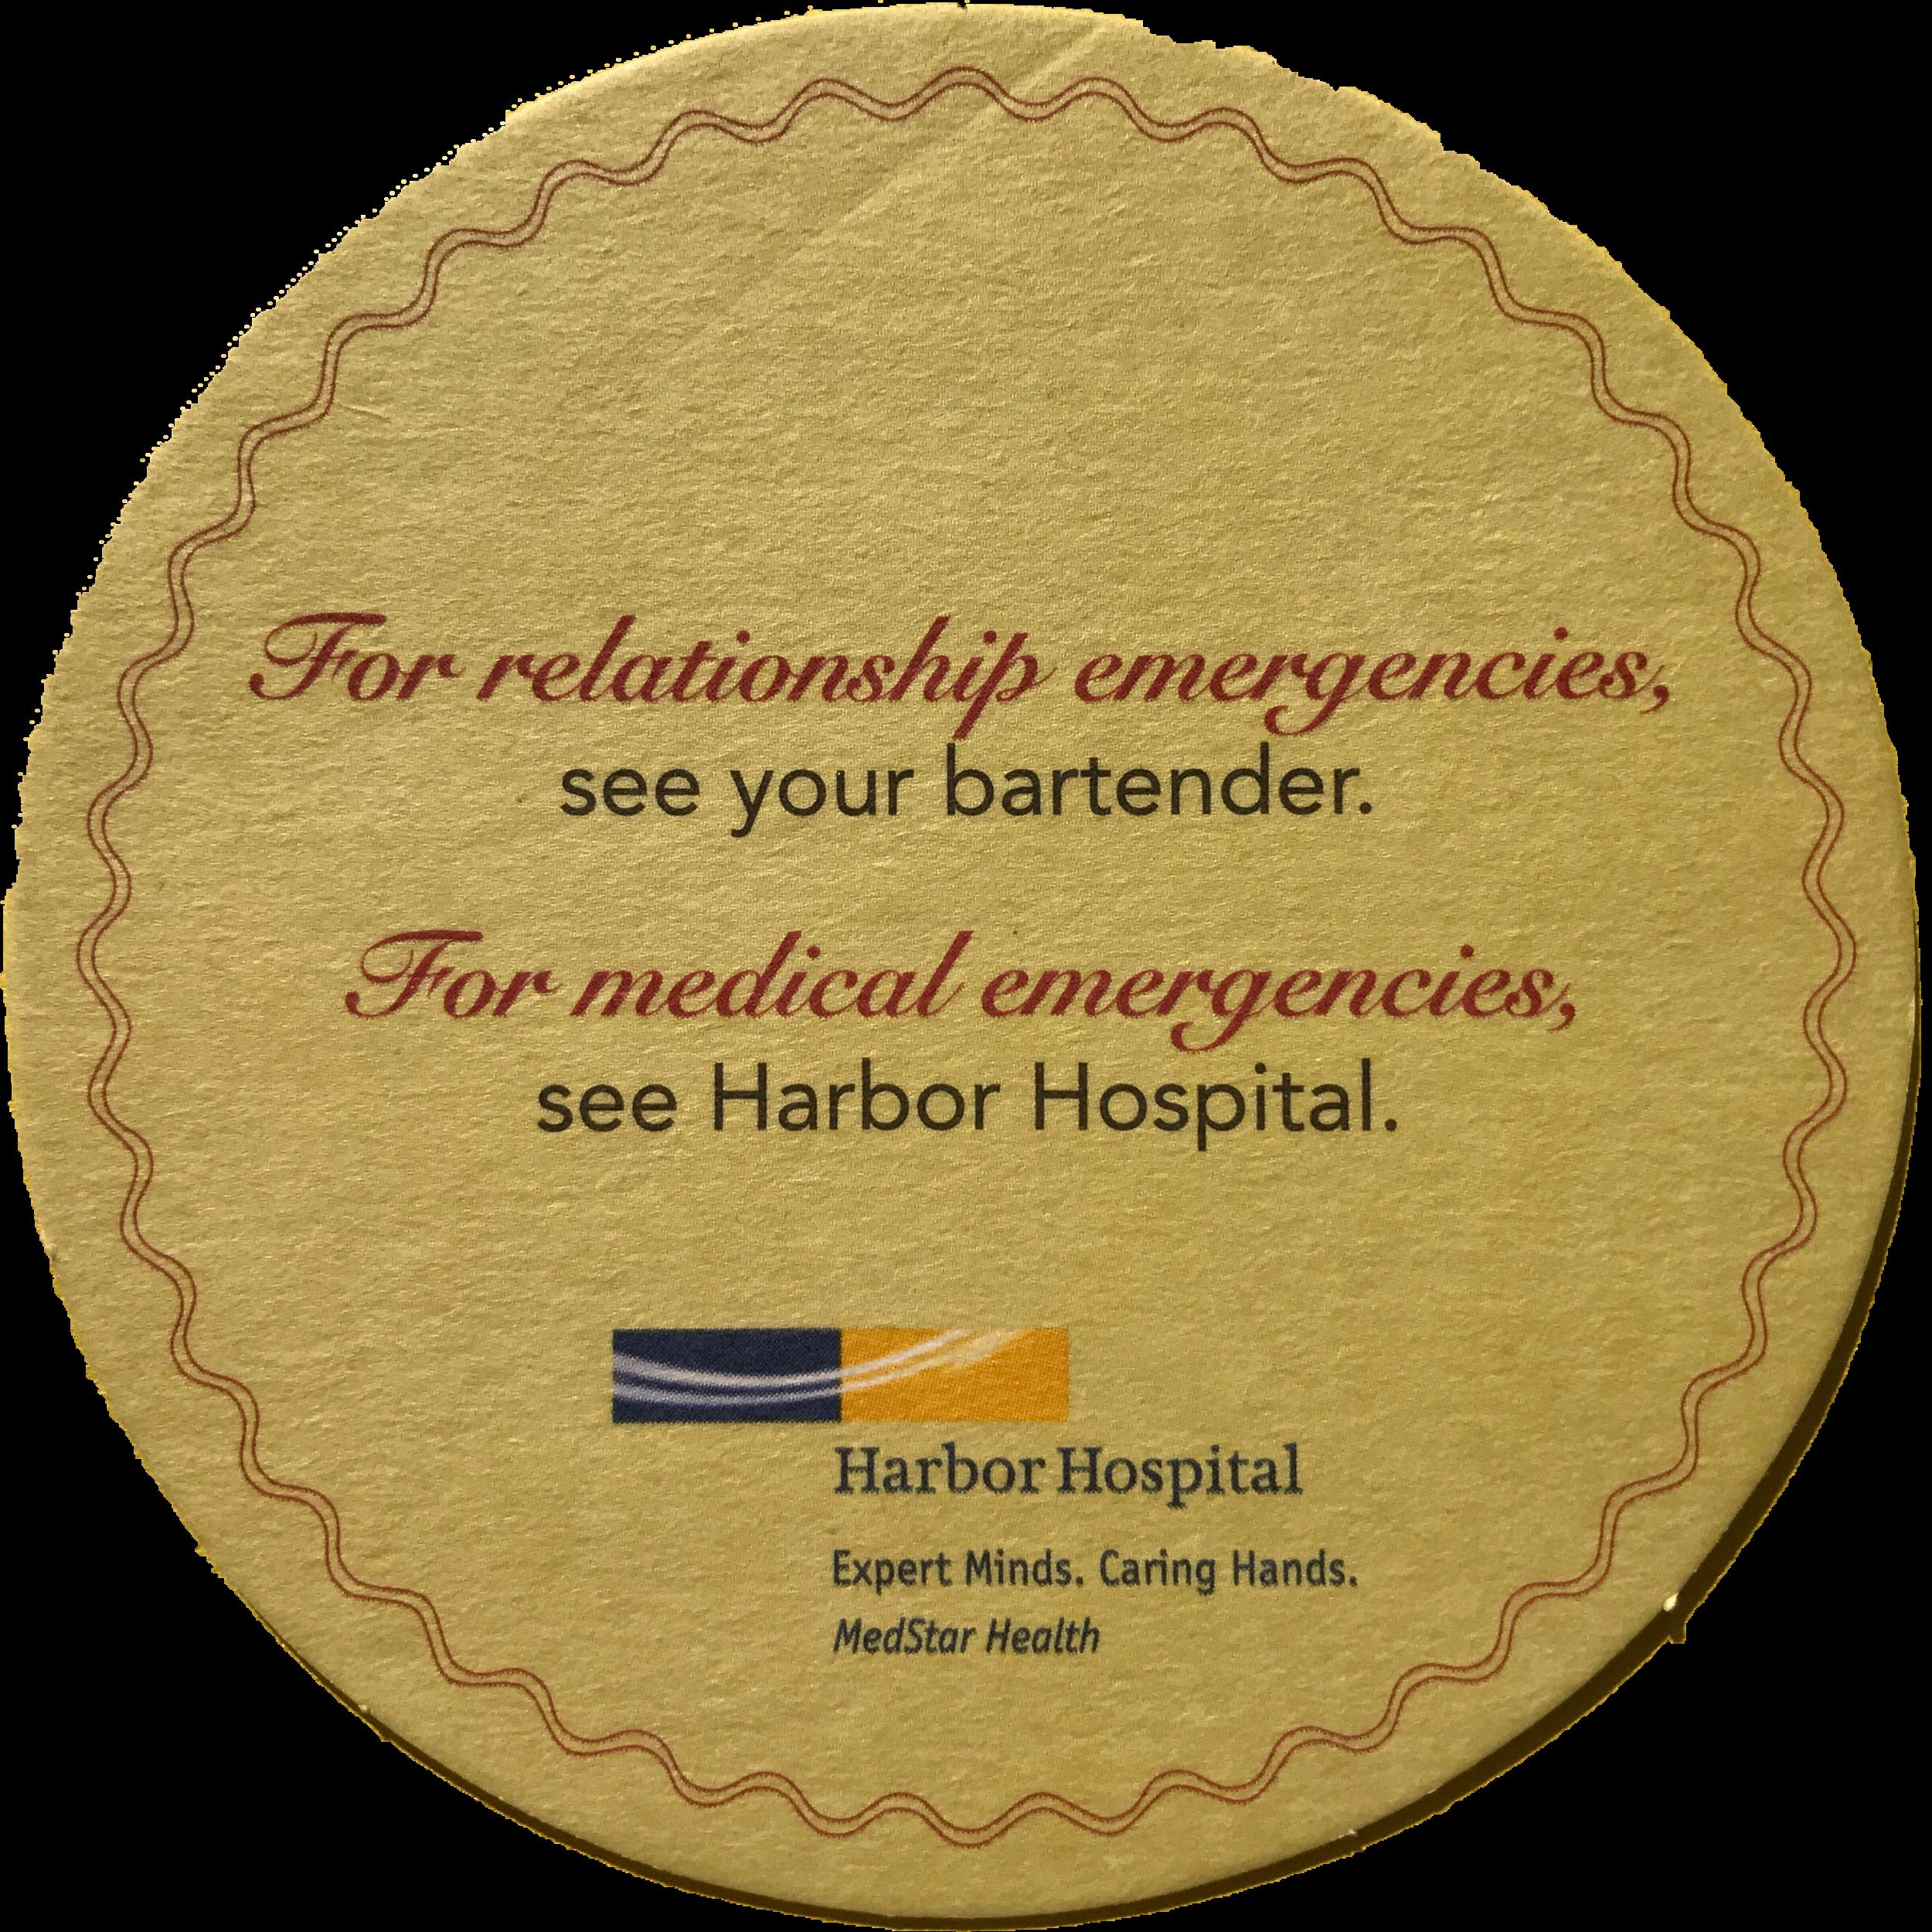 harbor hospital.png